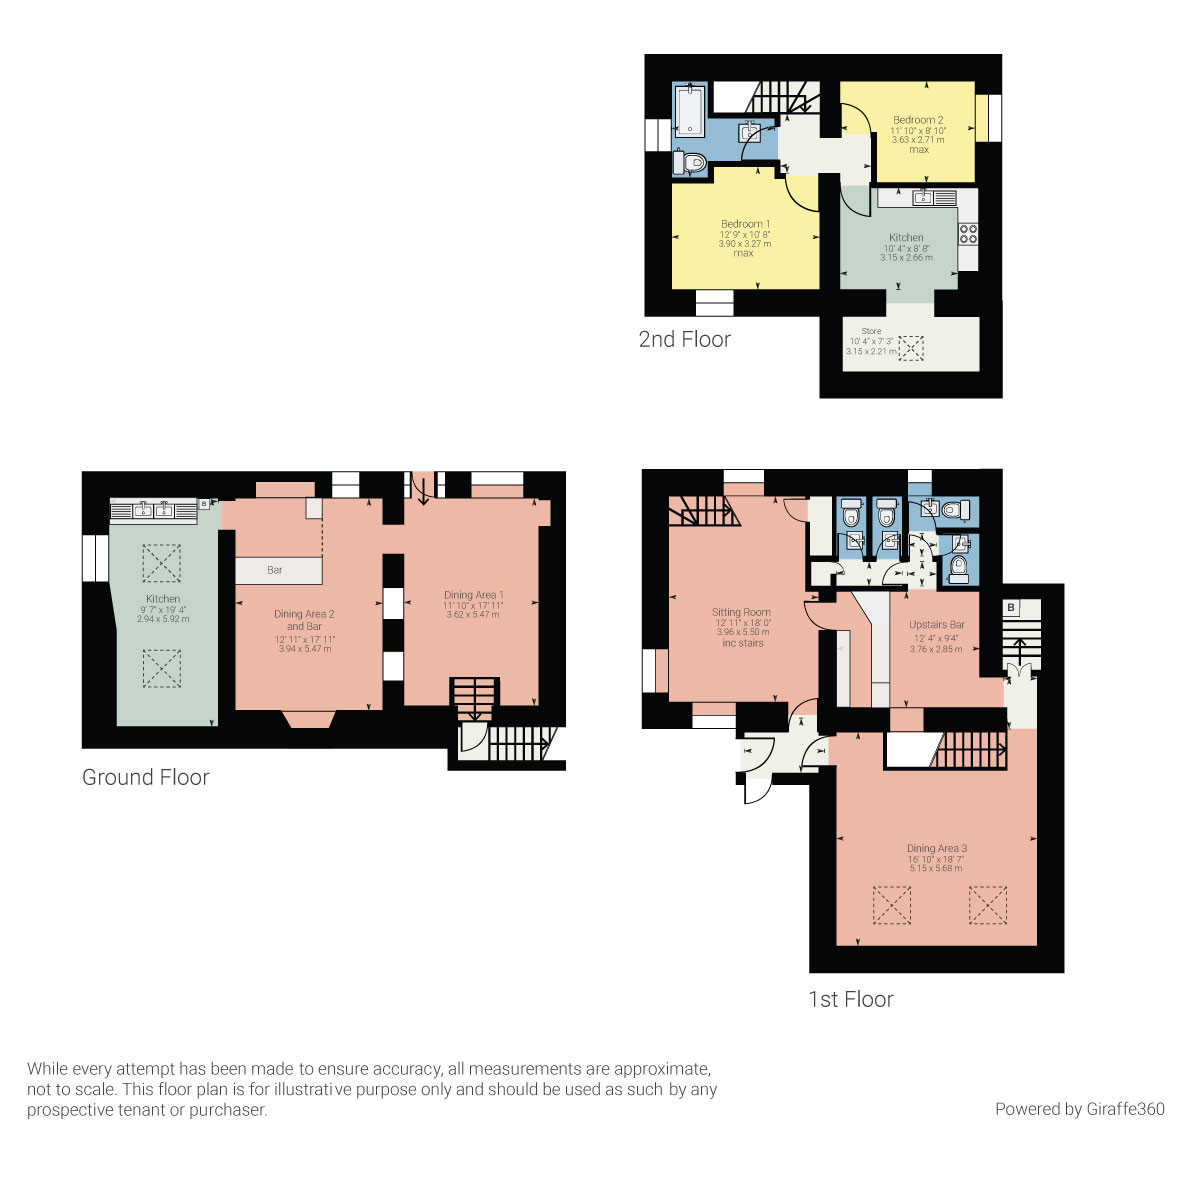 Floorplan Villa Positano, Ash Street, Bowness On Windermere, Cumbria, LA23 3EB